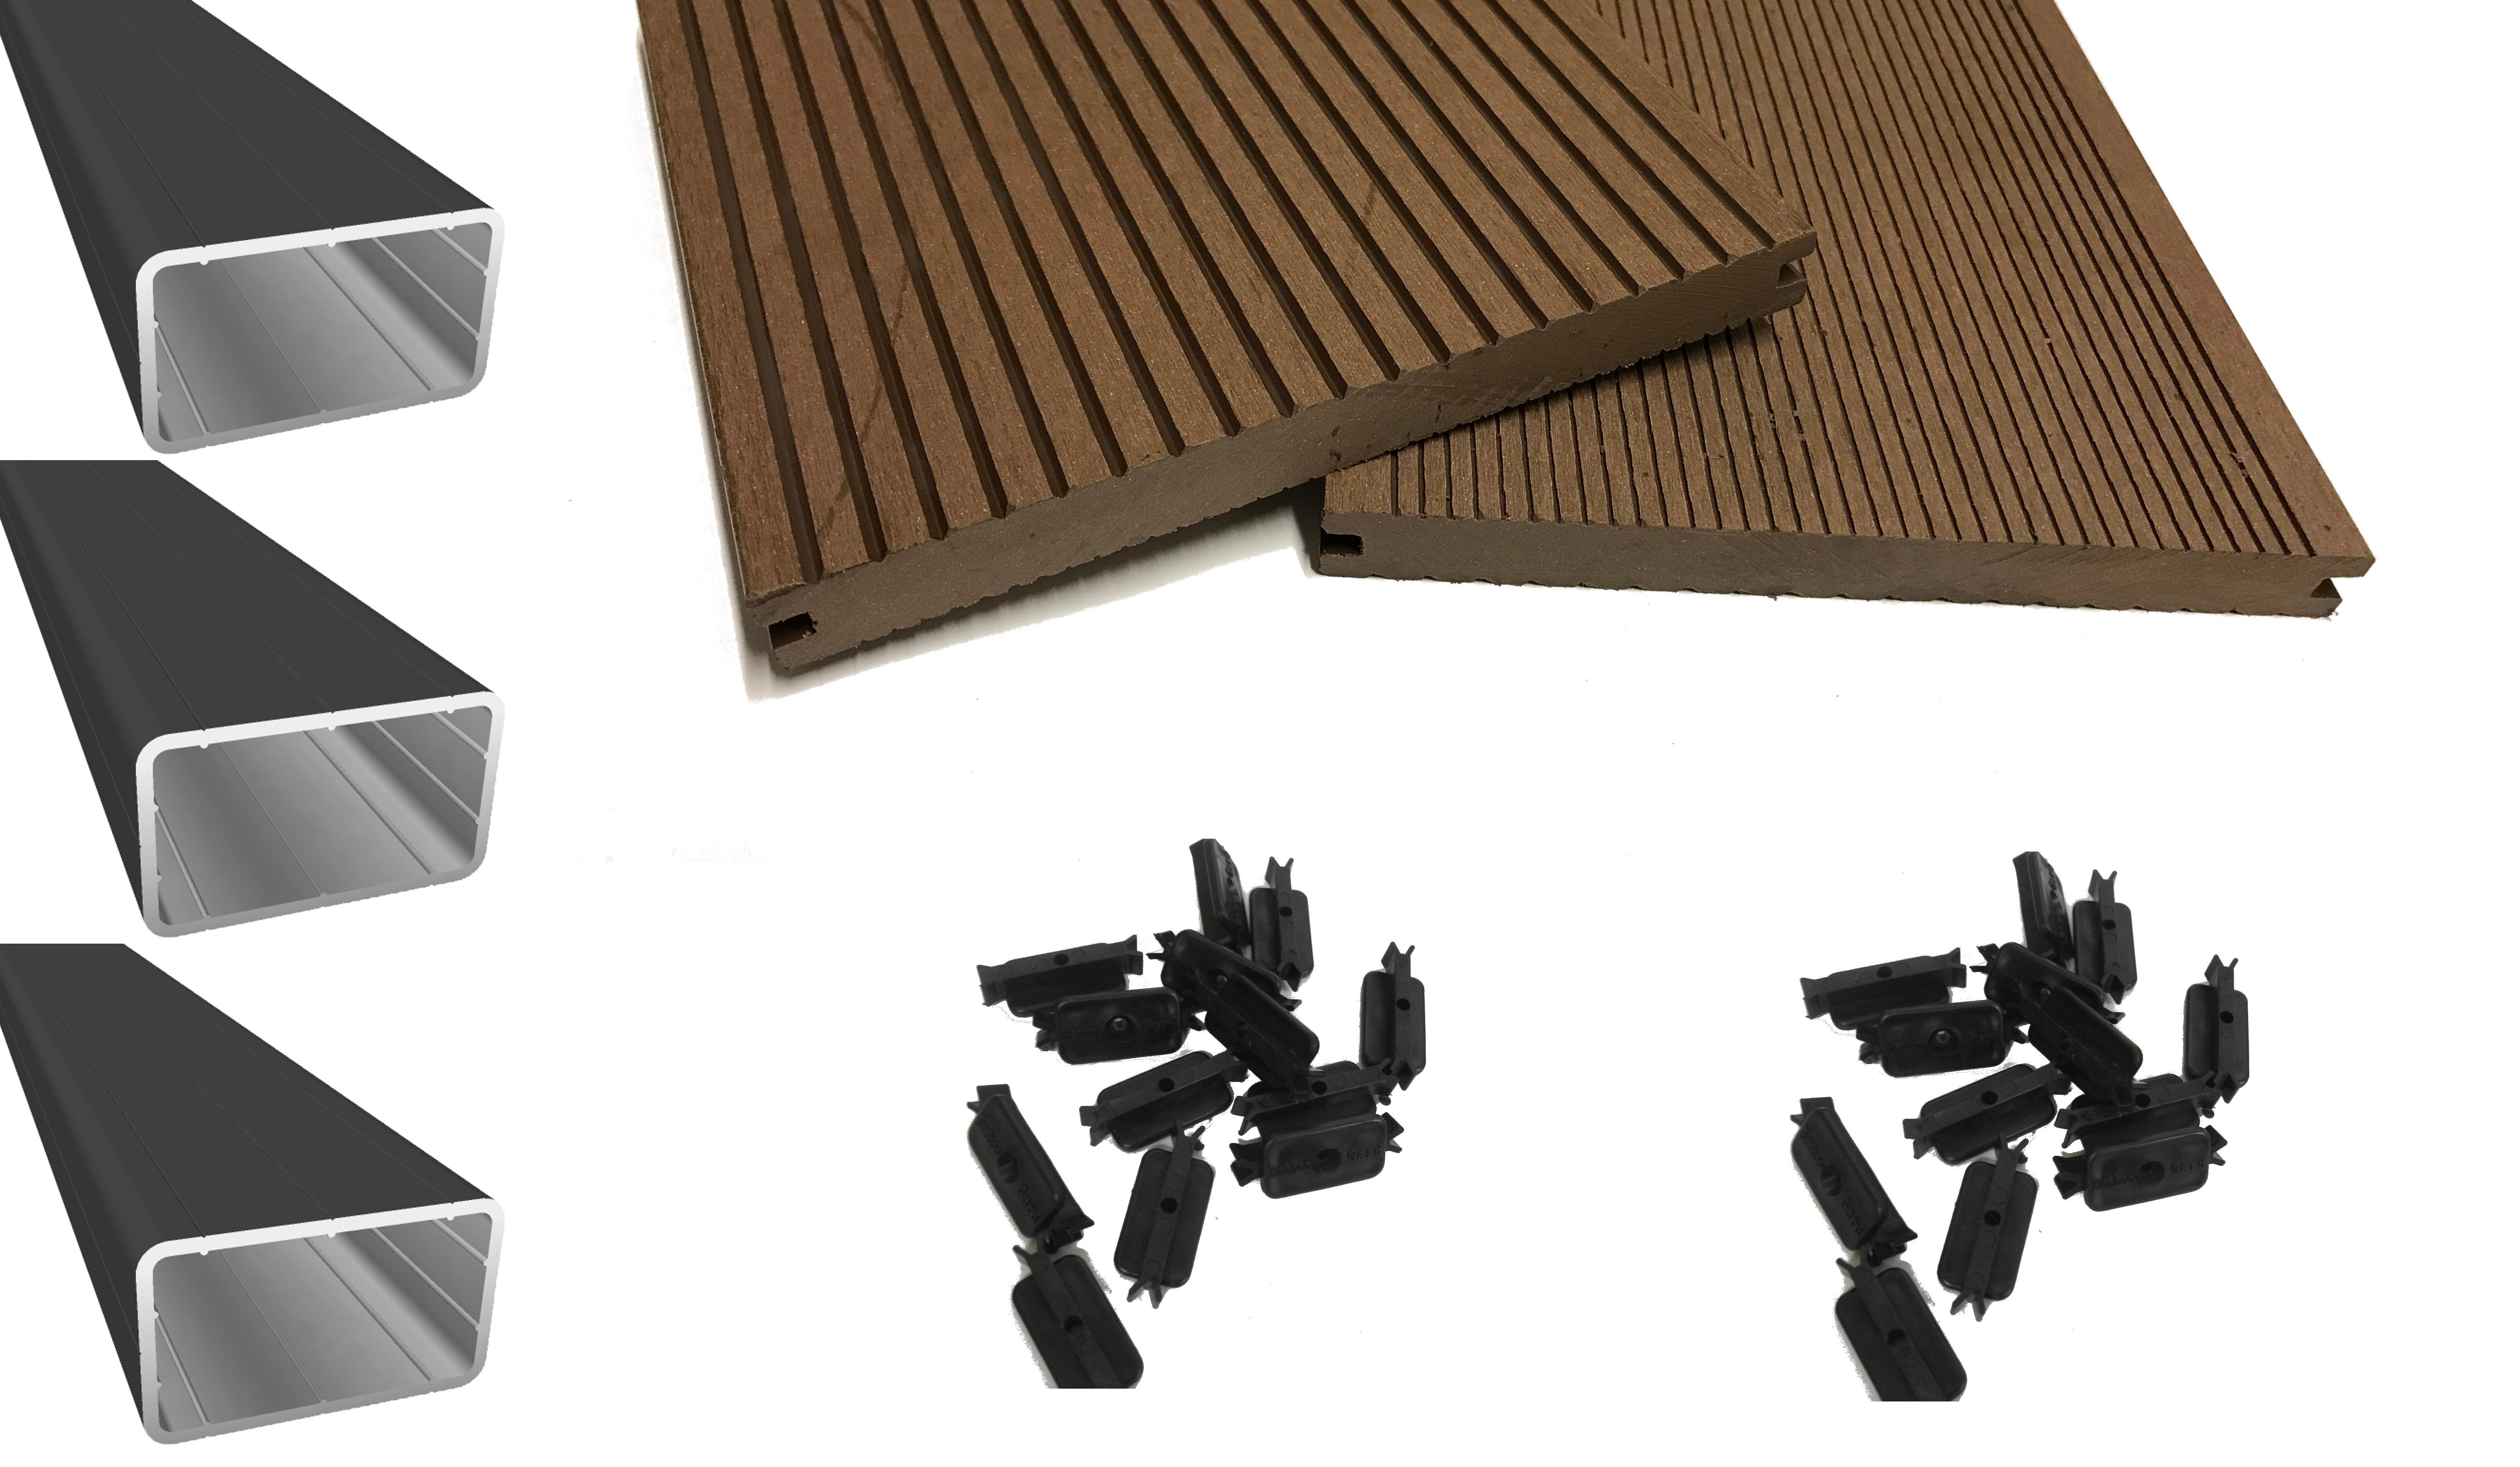 wpc terrassendiele komplettset profi xl dunkelbraun massiv 200 mm breit holzwurm obersayn. Black Bedroom Furniture Sets. Home Design Ideas